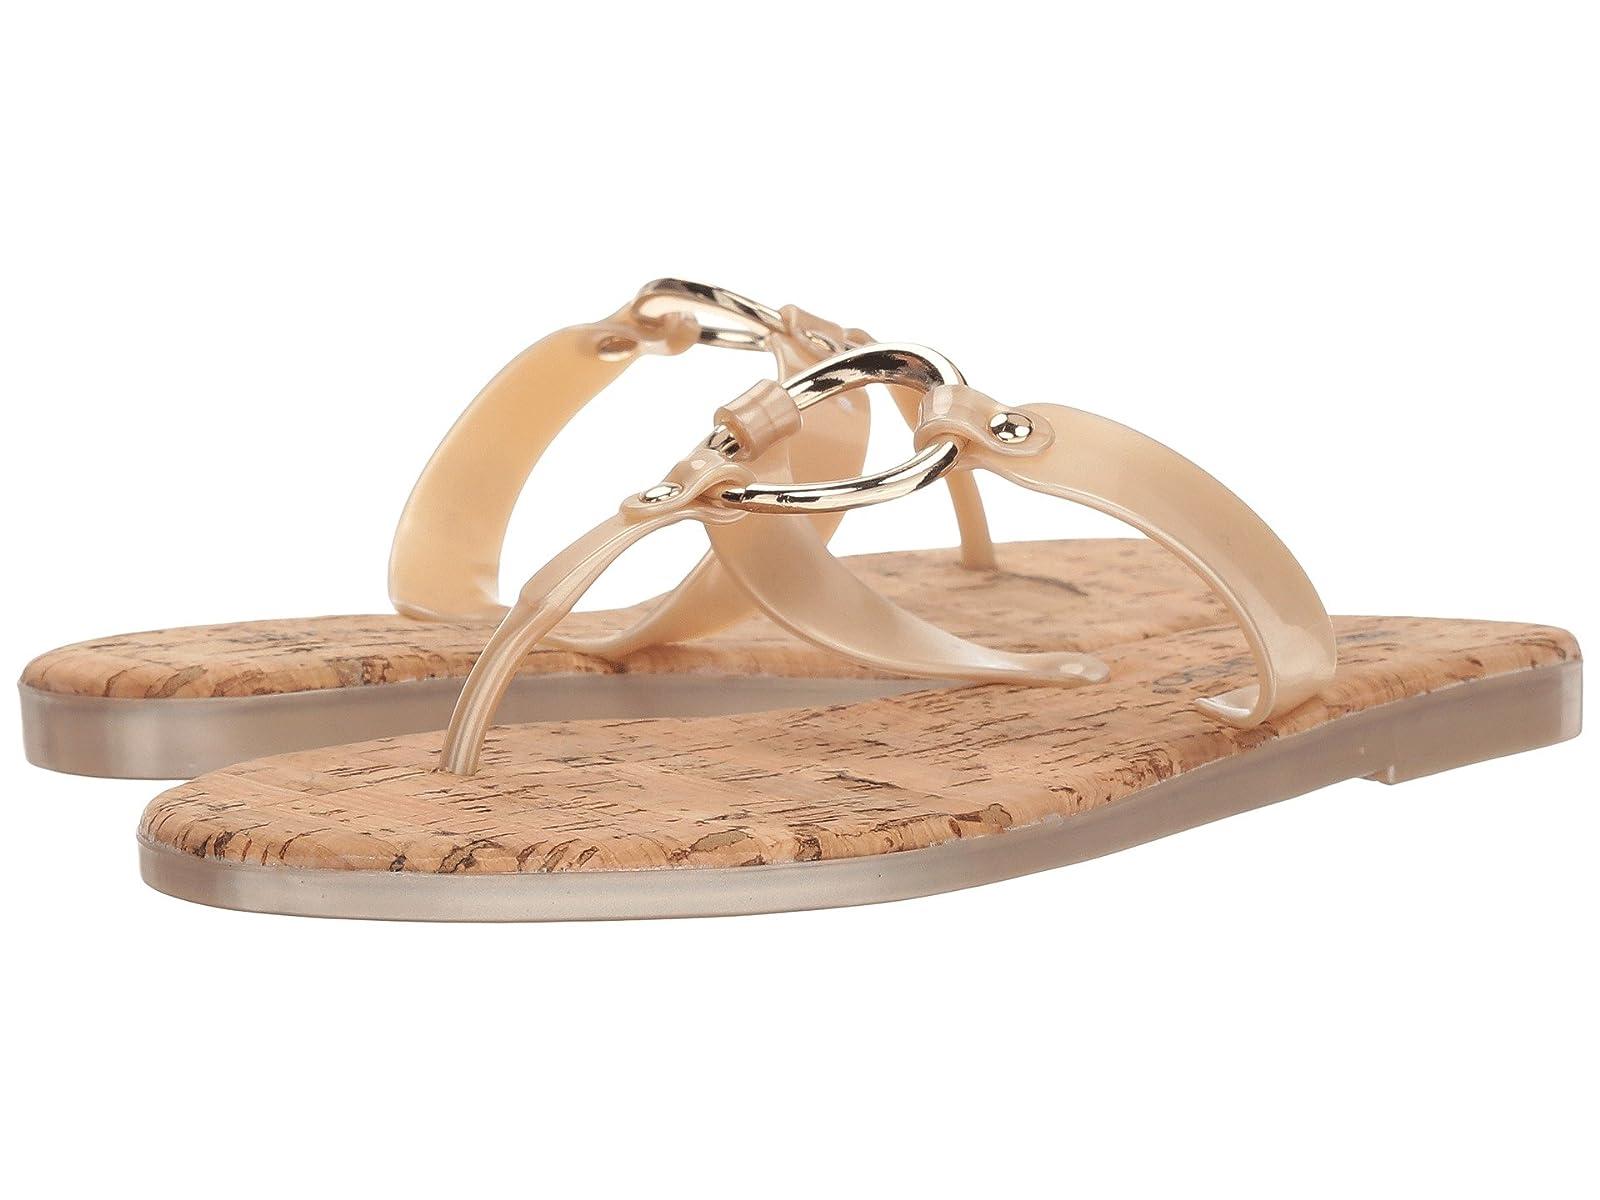 Bernardo Matrix JellyComfortable and distinctive shoes